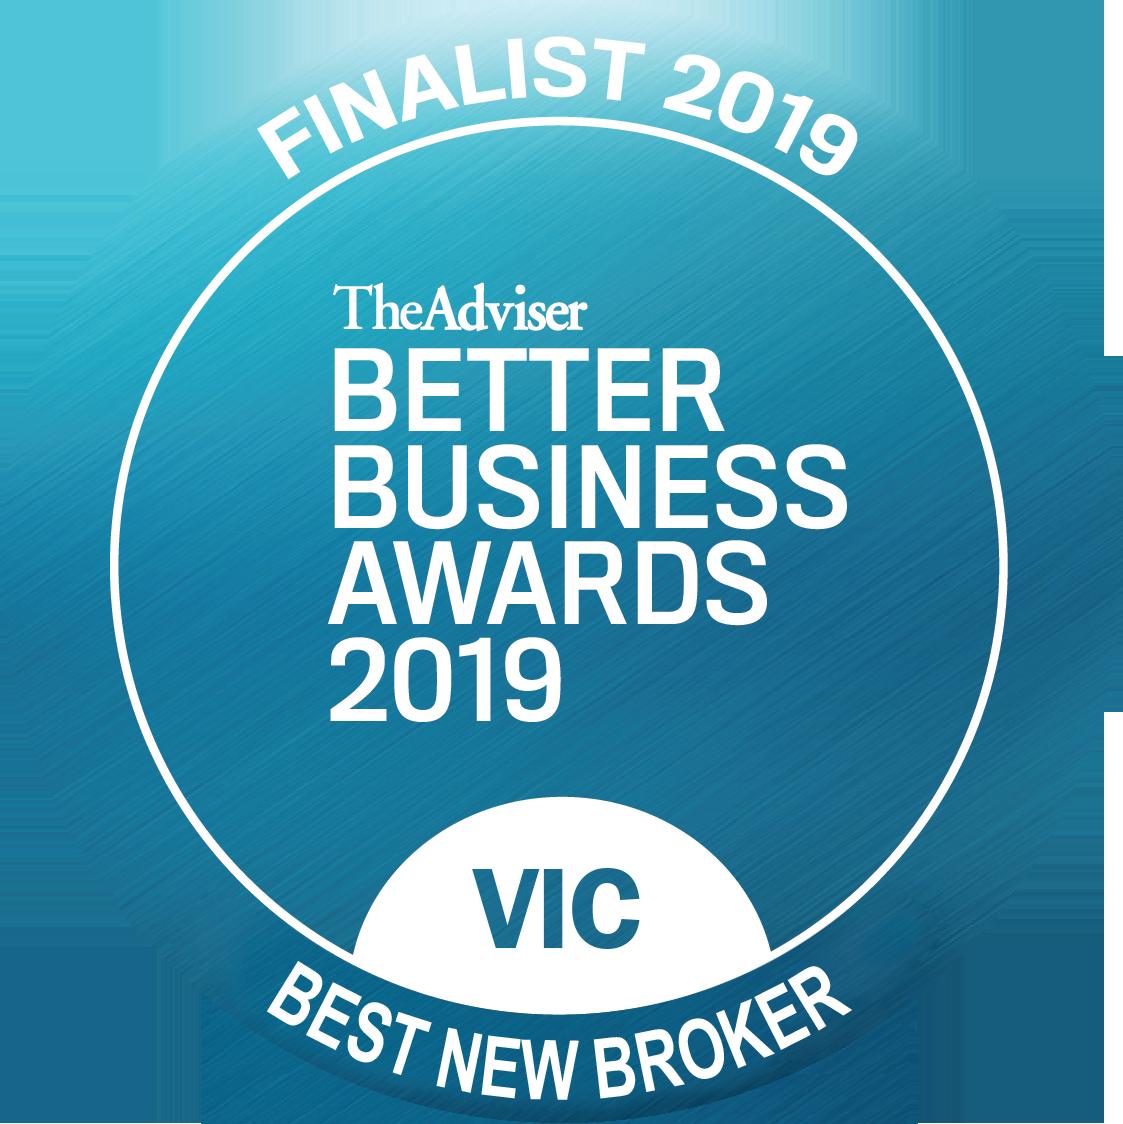 Best New Broker - Better Business Awards 2019